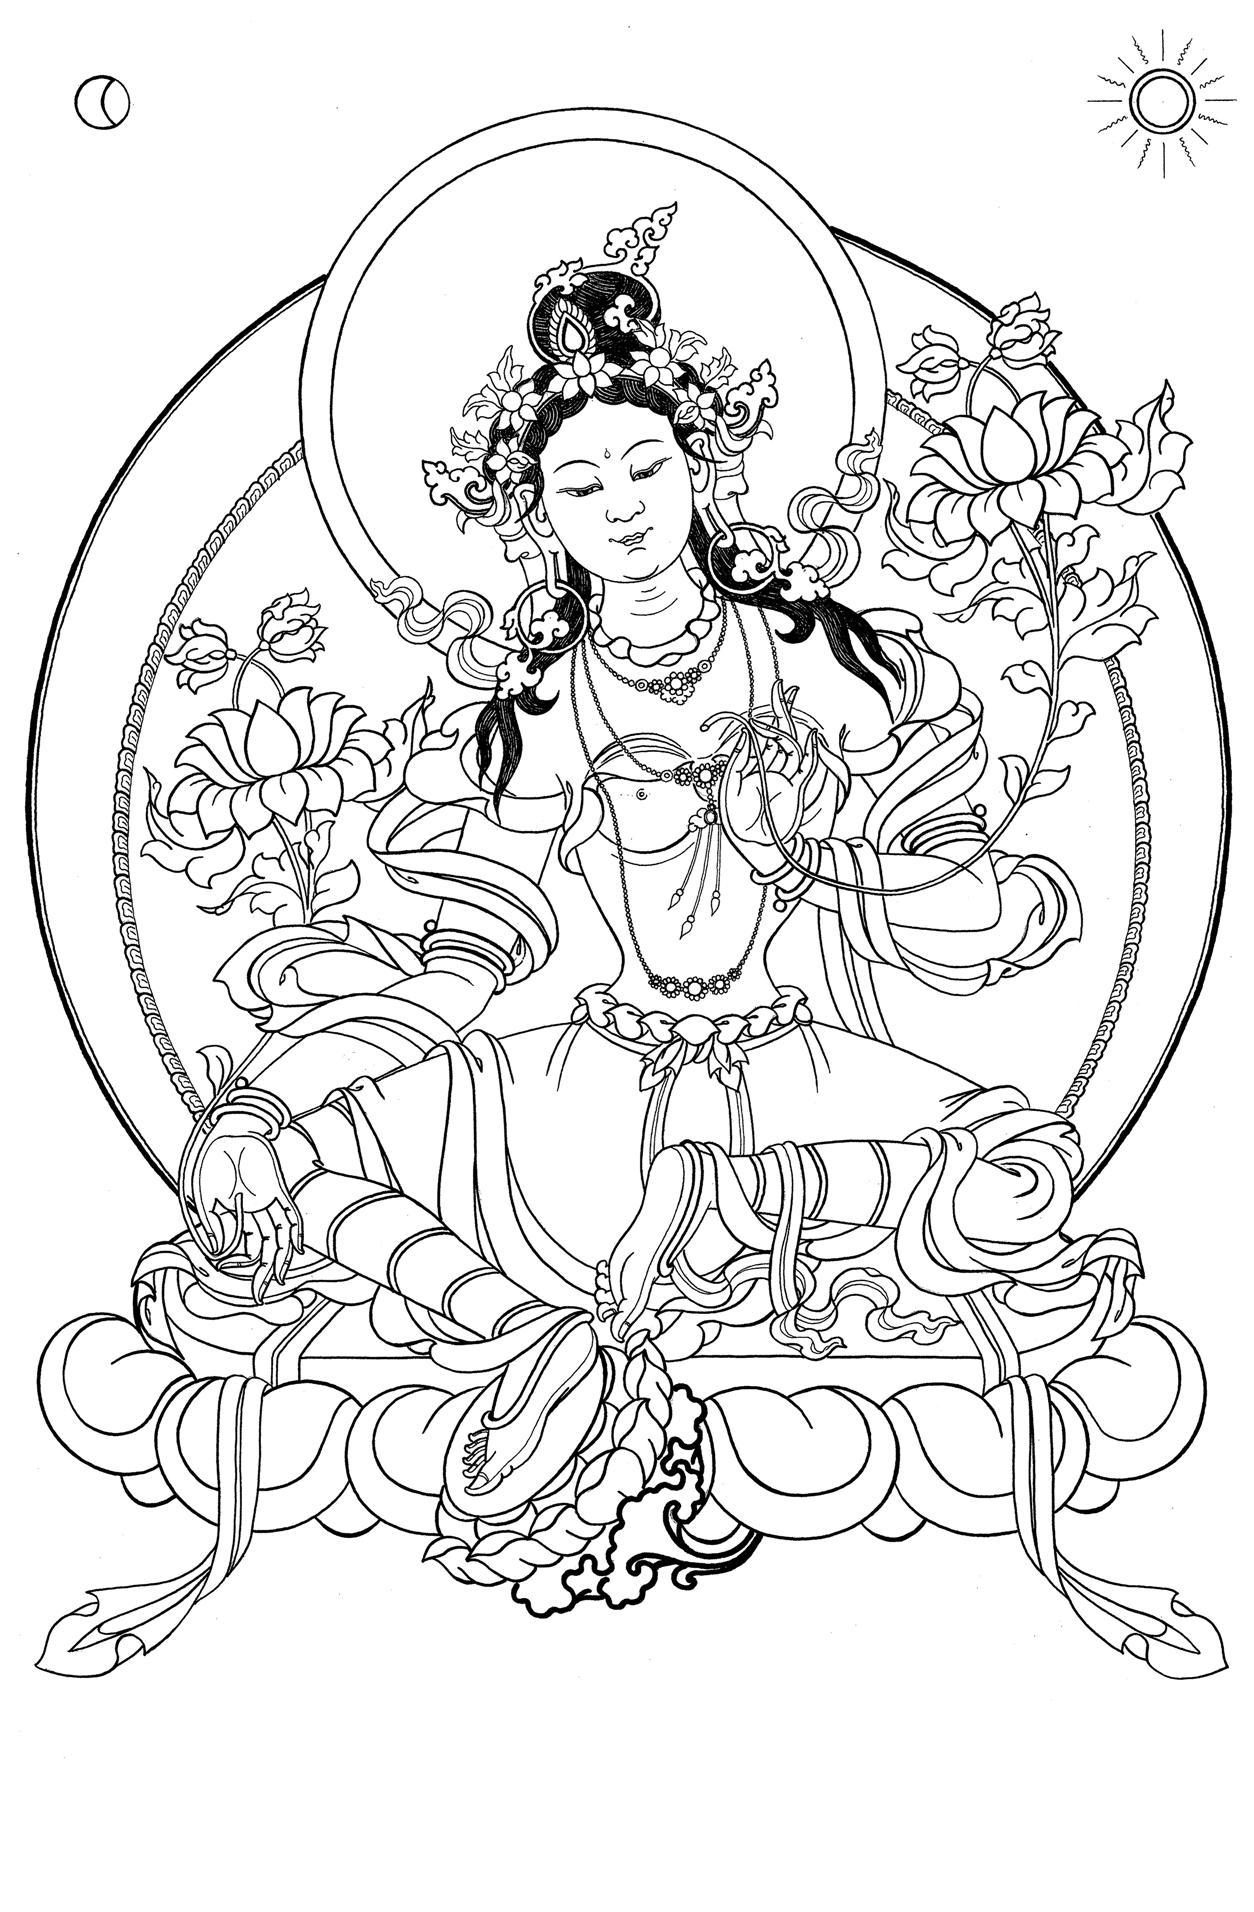 1000+ images about Buddhas & Bodhisattvas on Pinterest